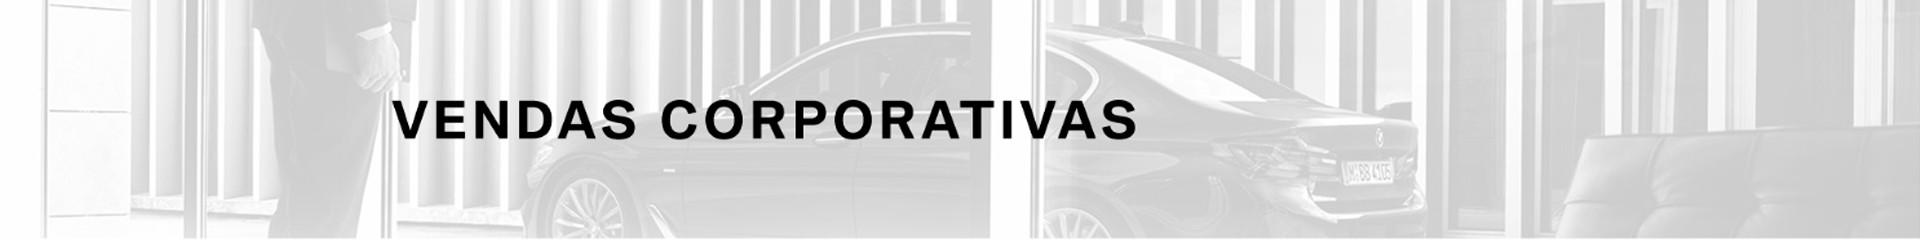 img-vendas-corporativas